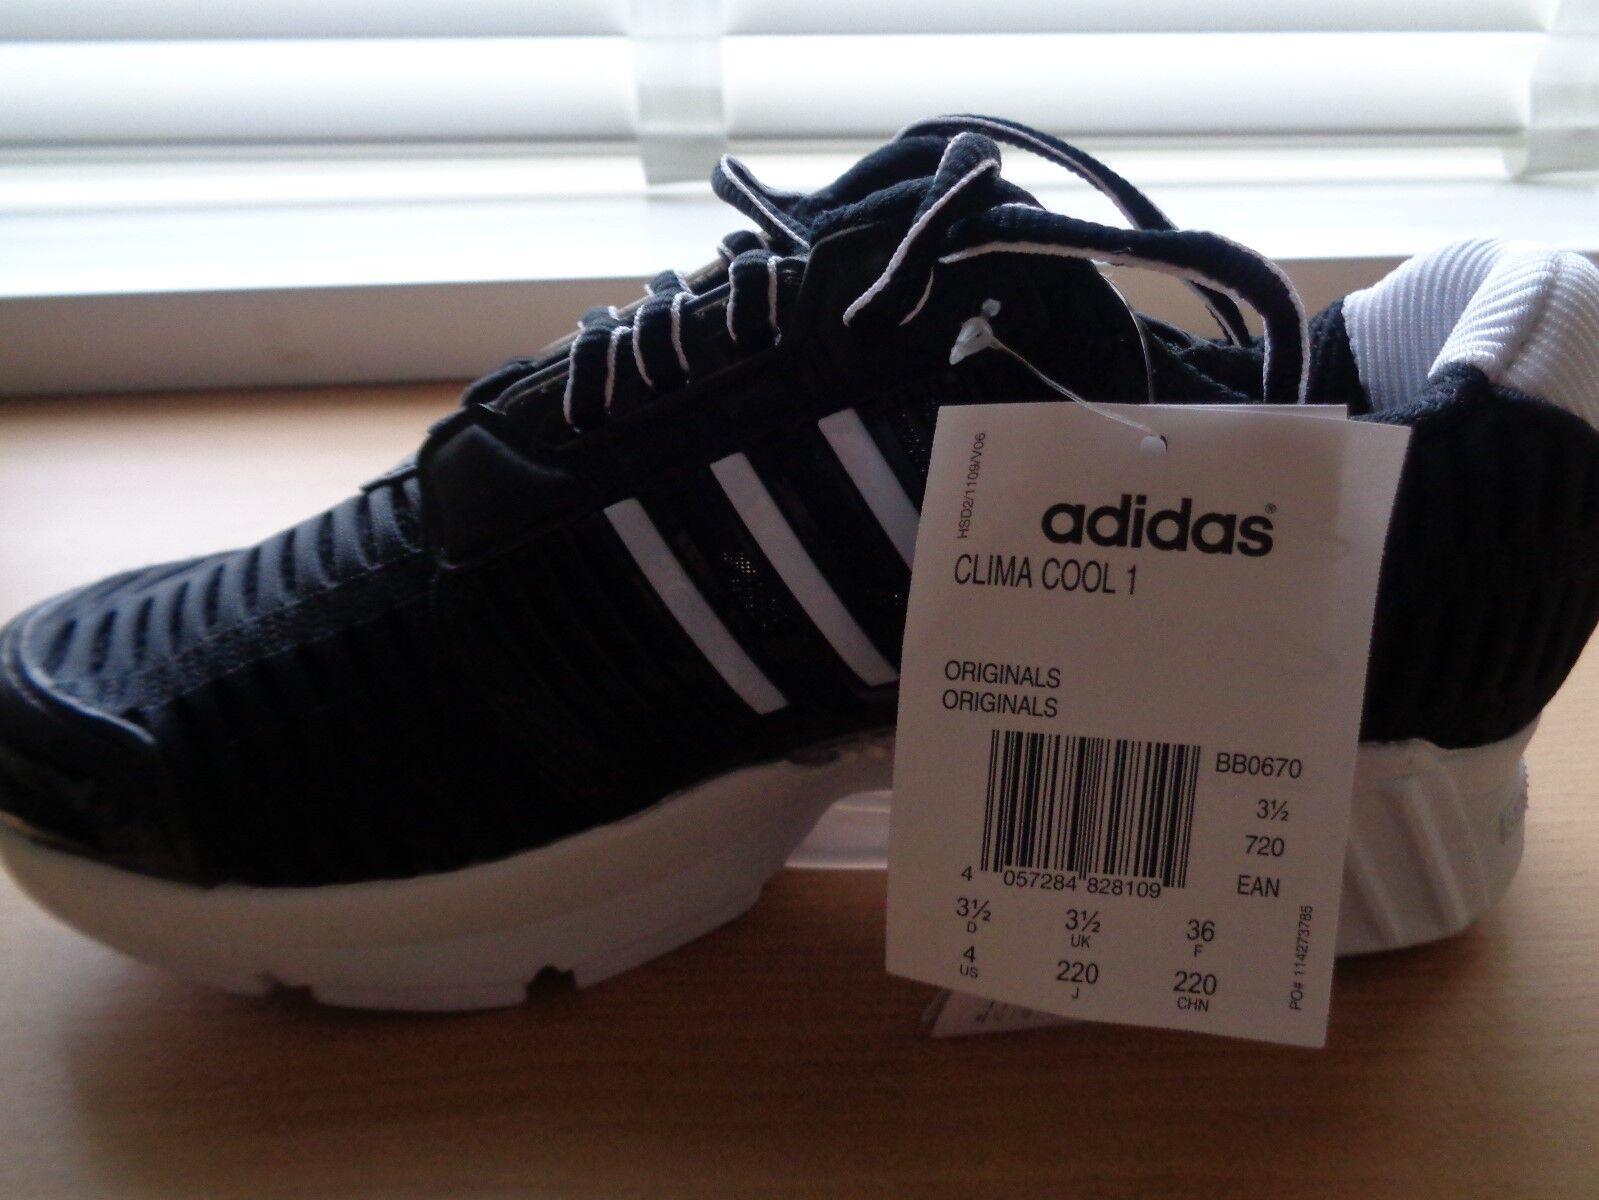 Adidas - Turnschuhe bbo670 cool 1 mens ausbilder - uns 41 1 / 3 uns - 8 neue + box e86df2